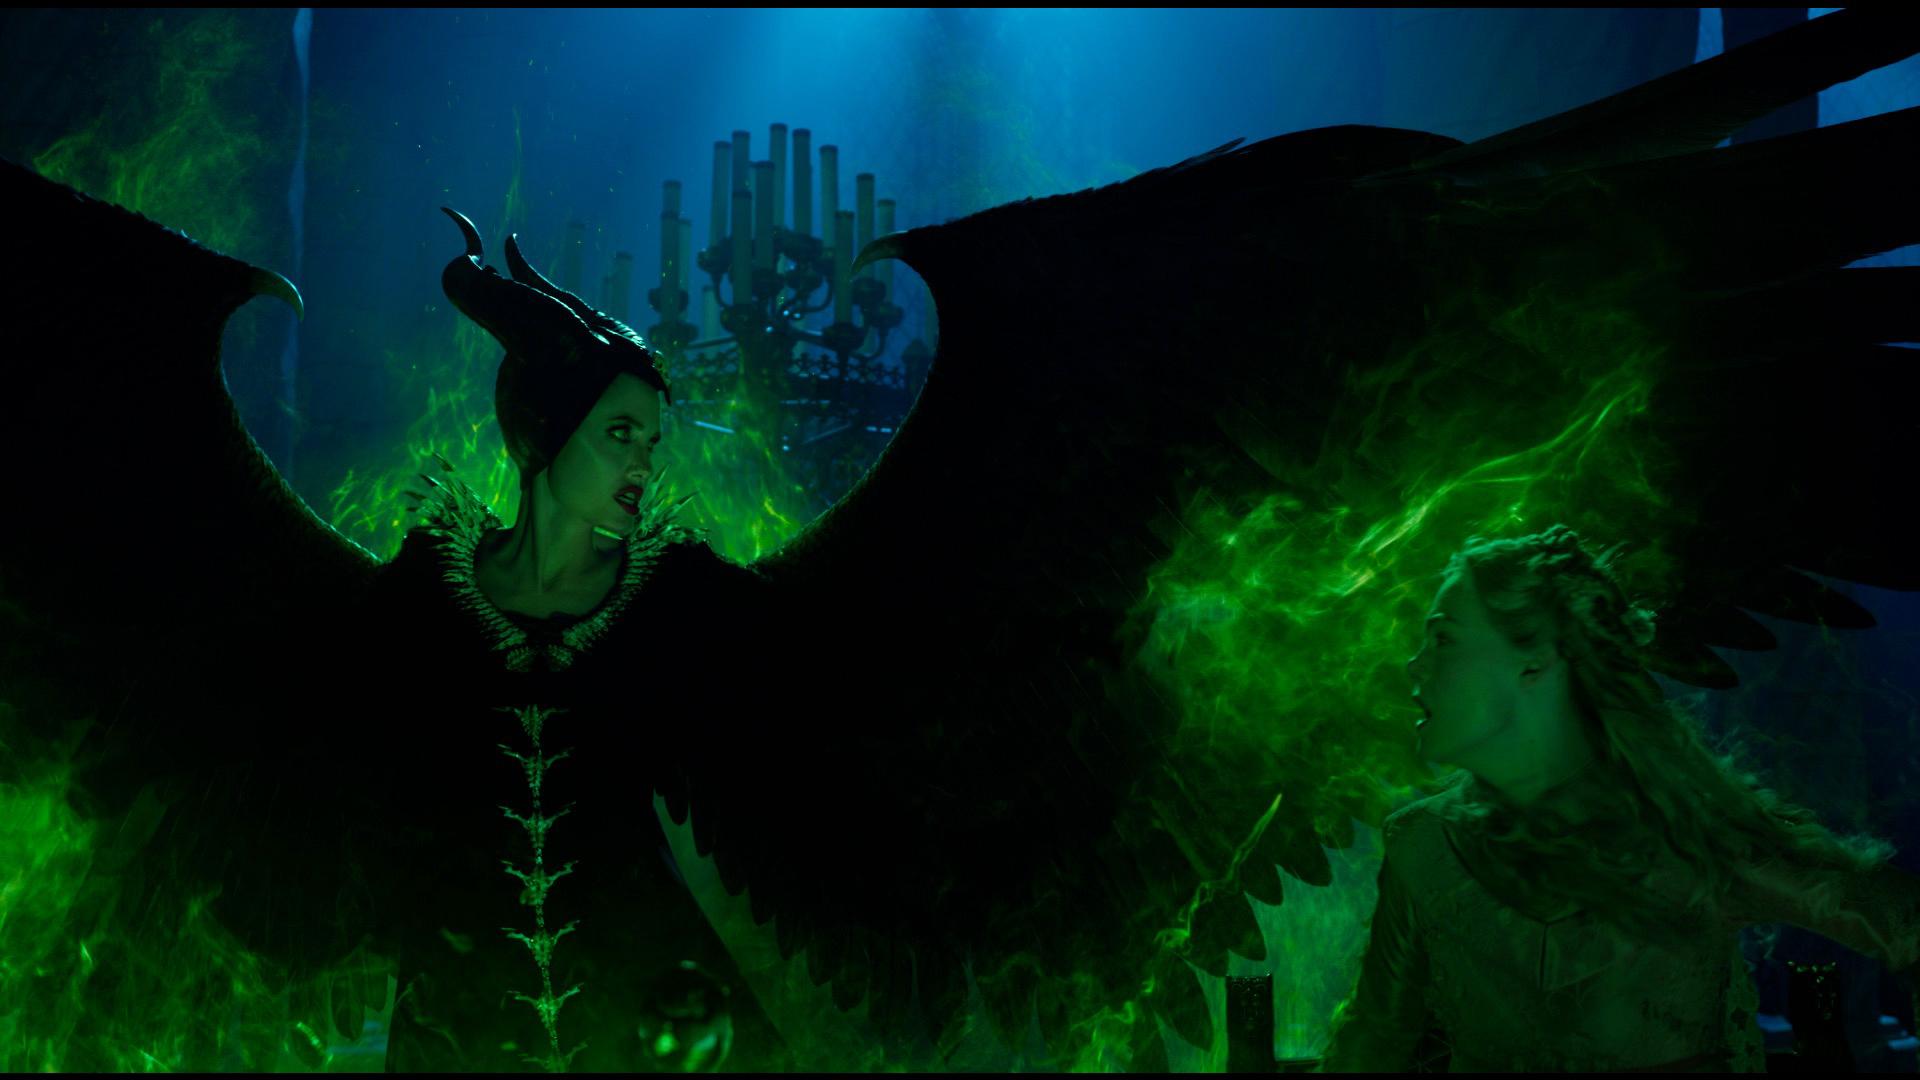 Maleficent Mistress of Evil, Disney, Disney films, live action, Sleeping Beauty